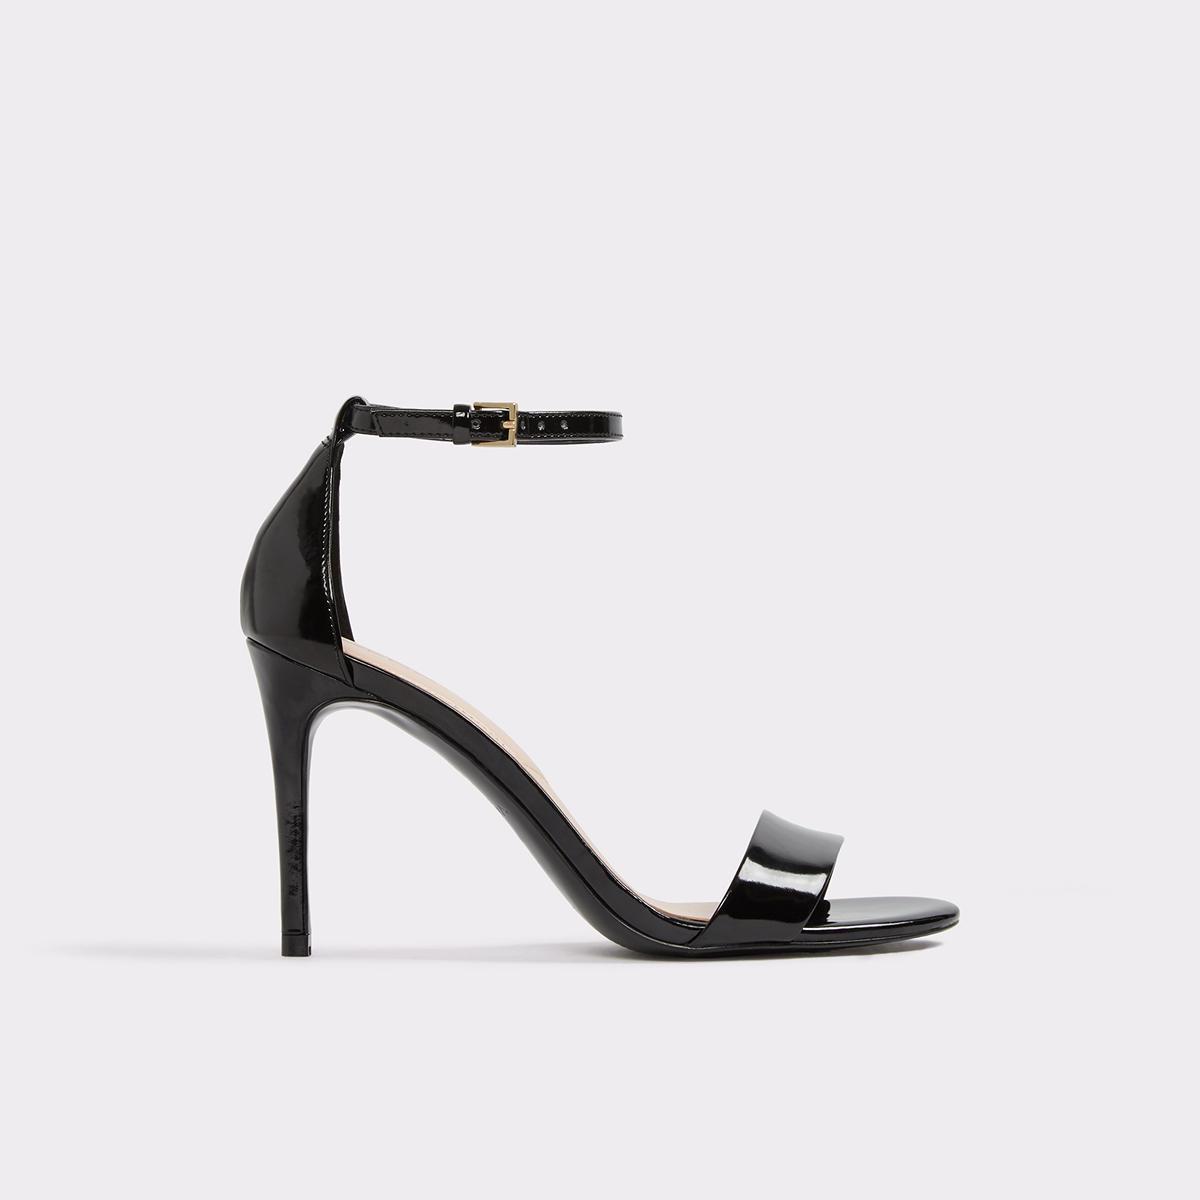 Cally Black Patent Black Patent Cally Women's Women's HeelsUs gIYvb6yf7